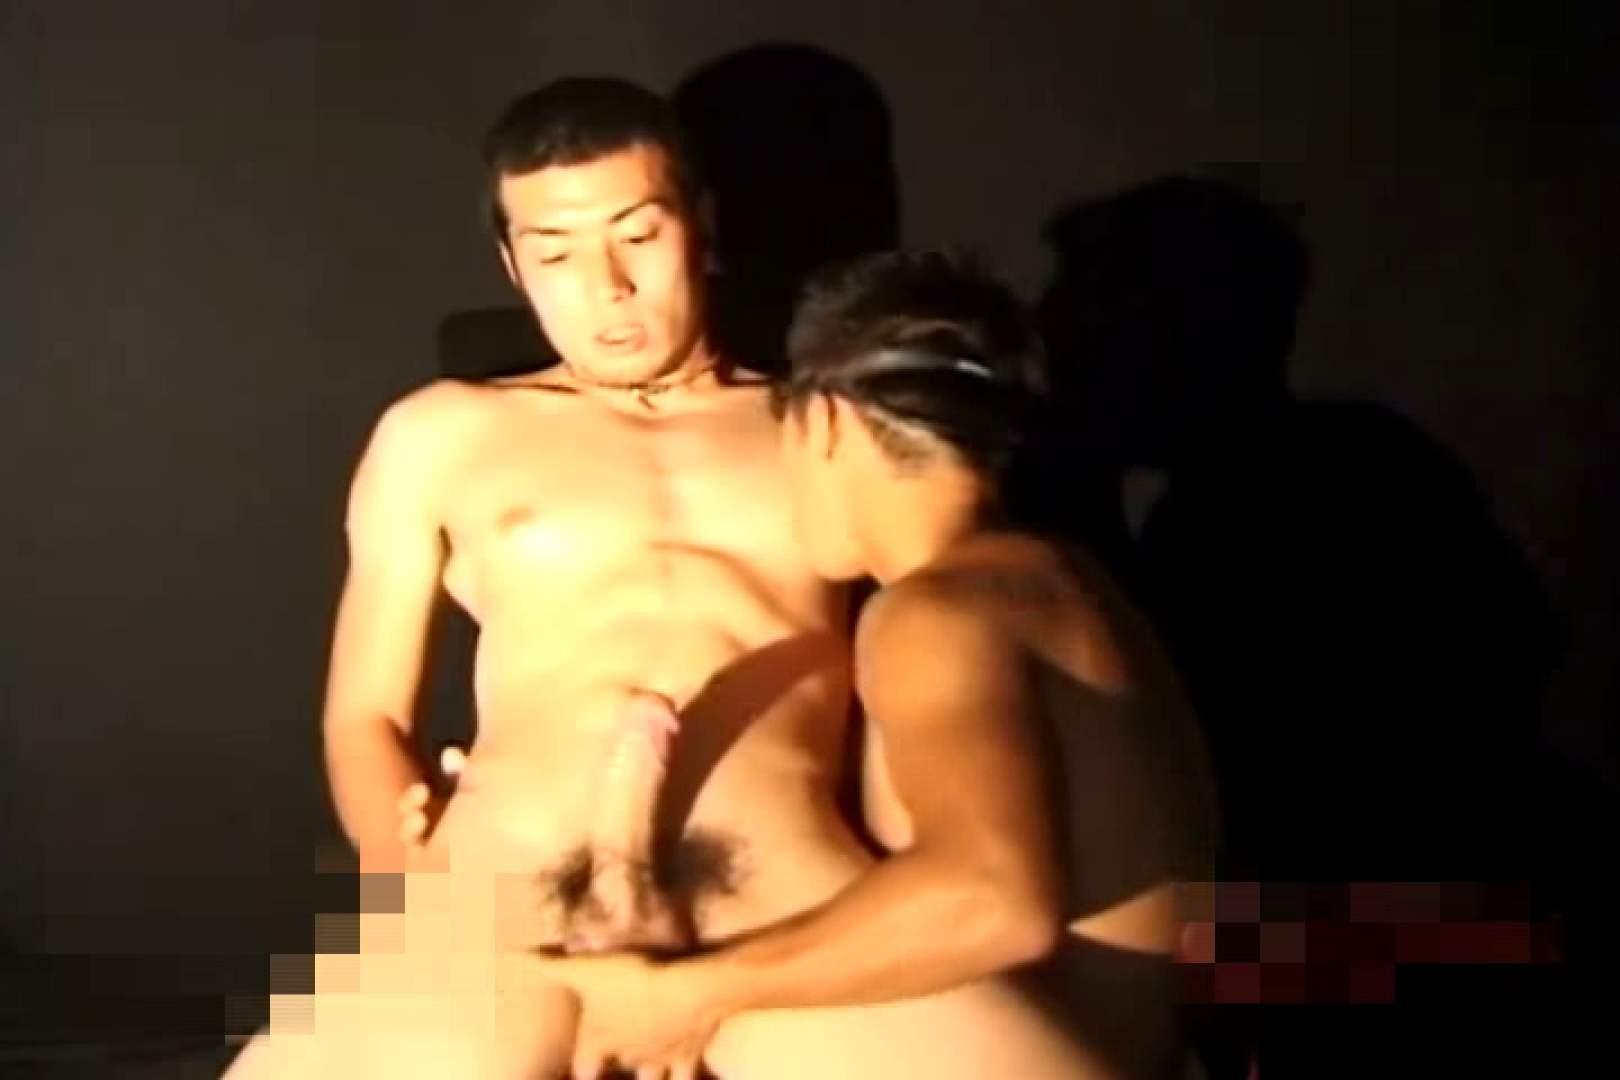 Beautiful muscle モッコリ野郎達!Vol.04 スリム美少年系ジャニ系 ゲイ精子画像 49連発 49